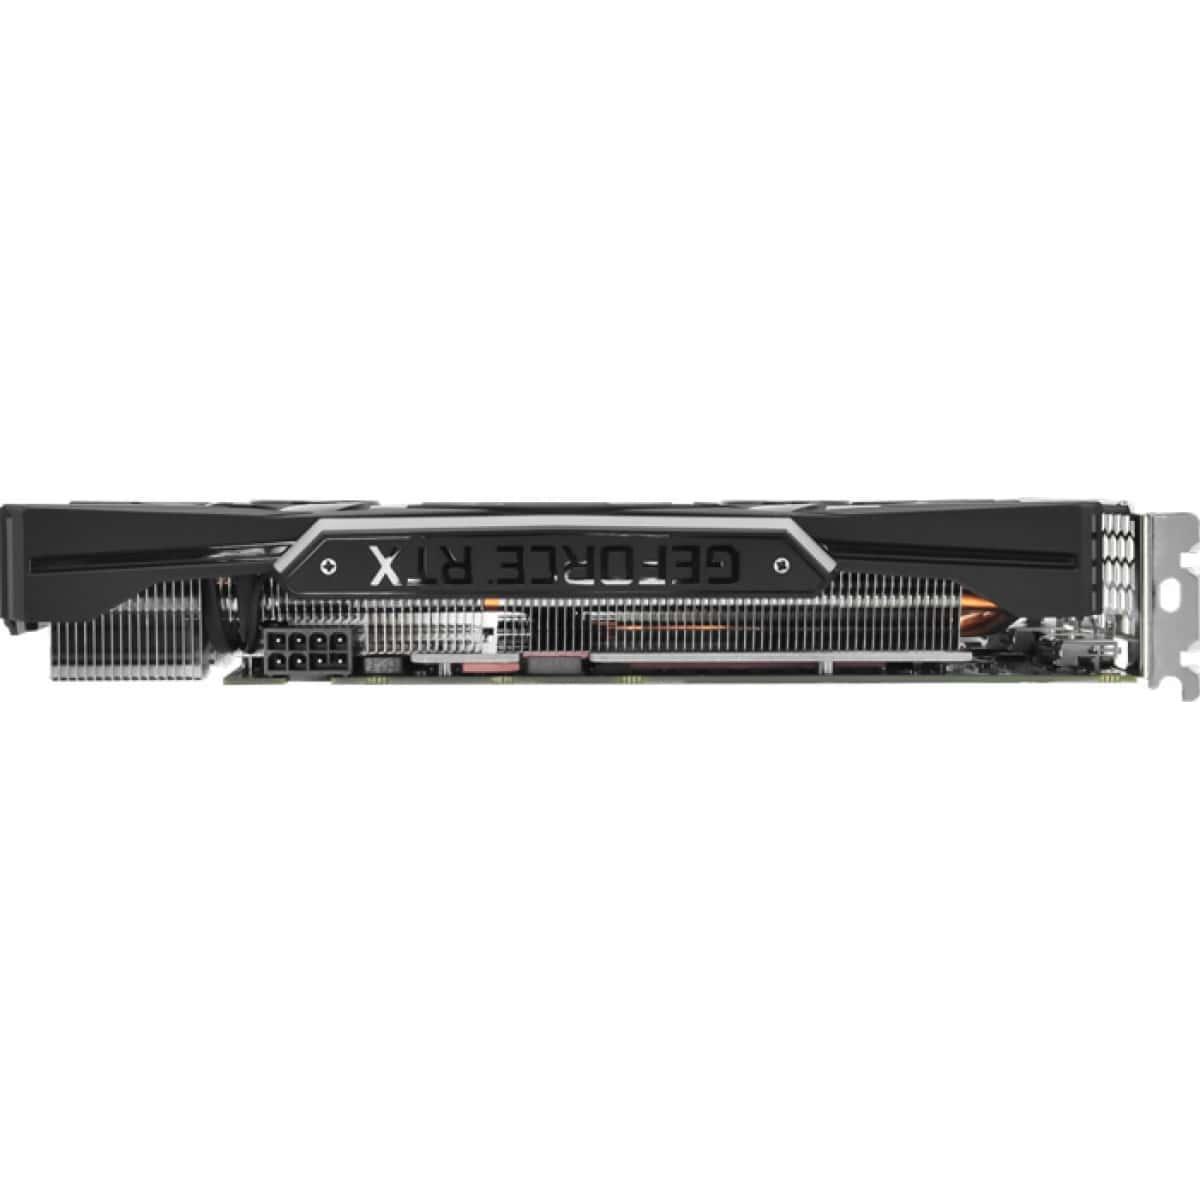 PLACA DE VÍDEO GEFORCE GAINWARD  RTX 2070 8GB GDDR6 256BITS - NE62070015P2-1062X